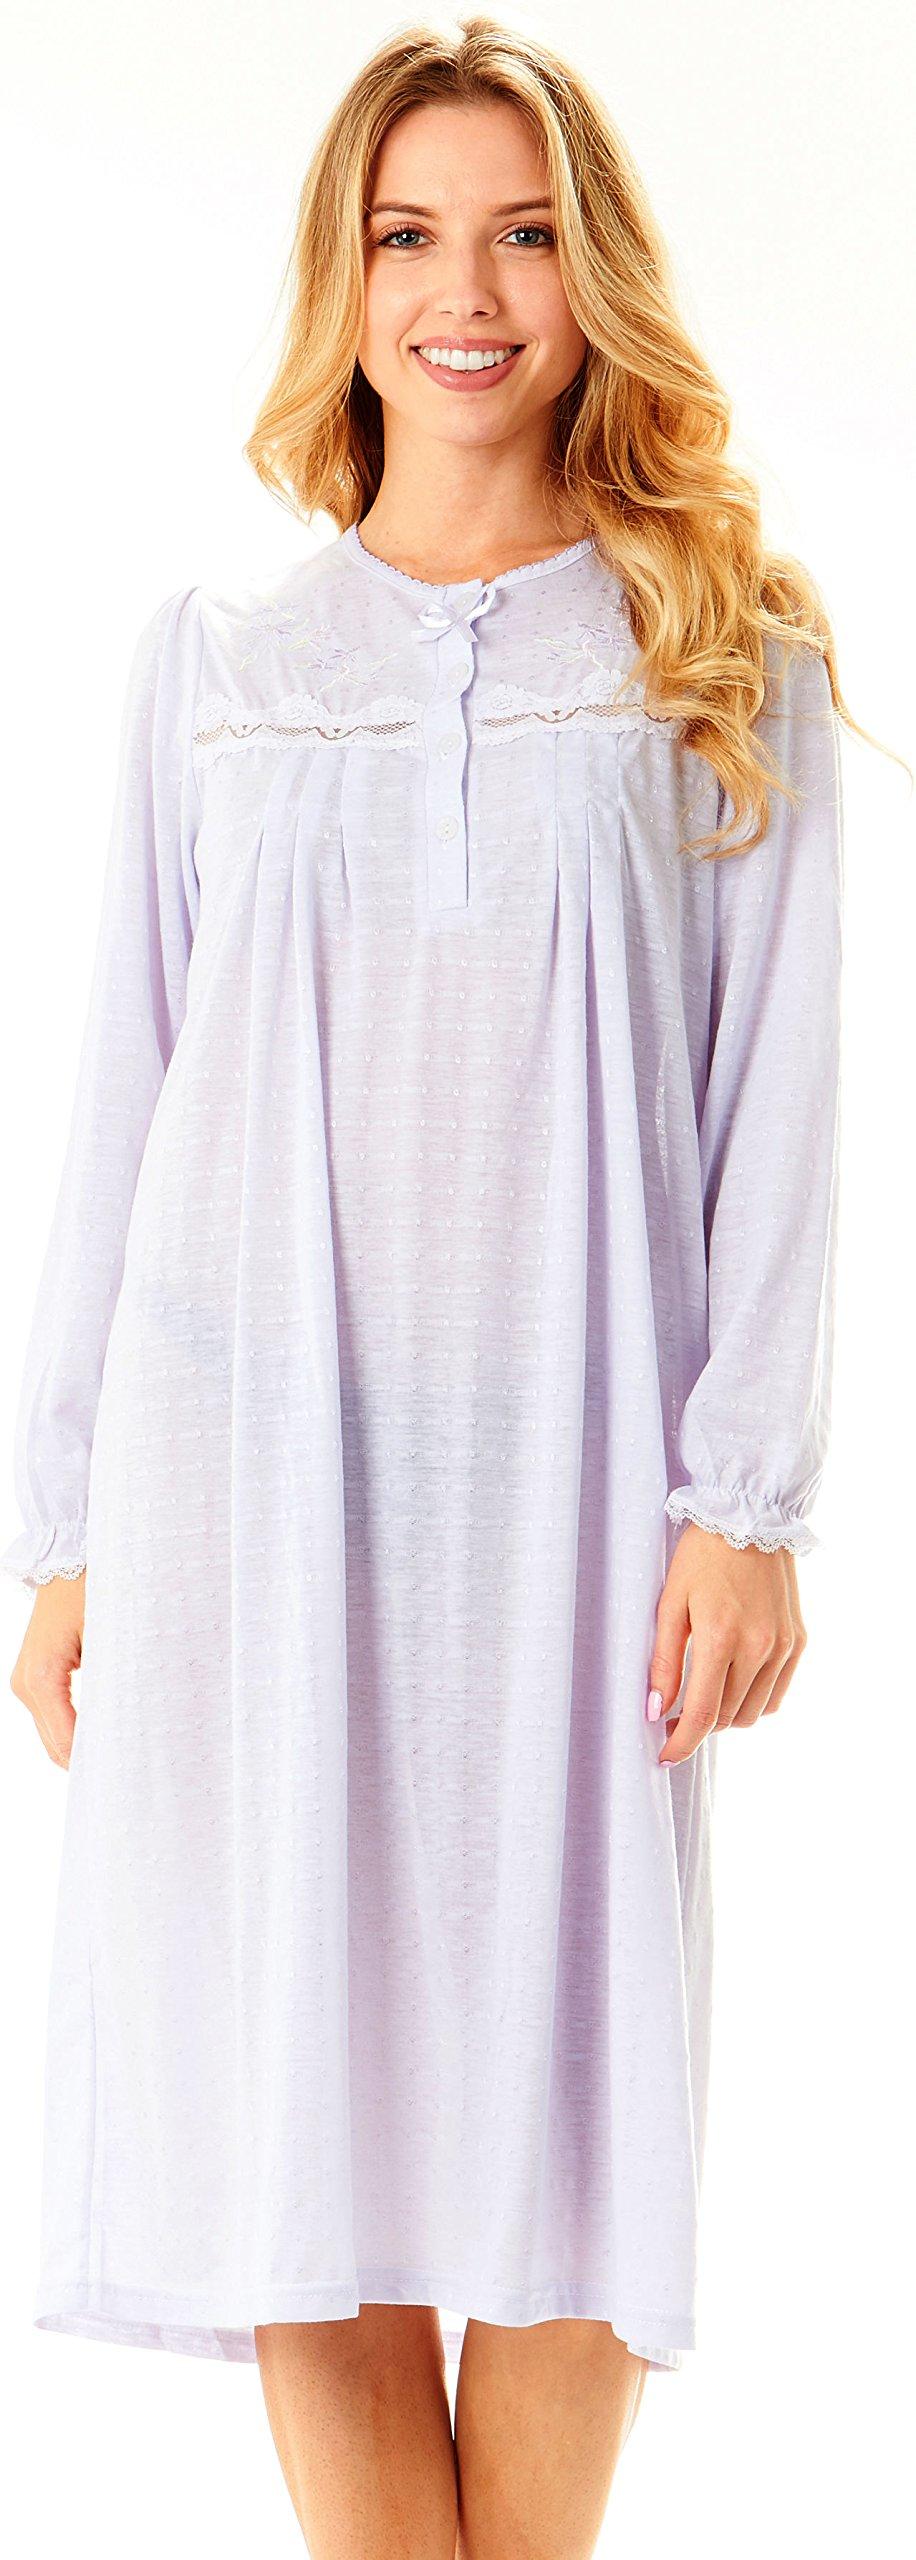 Plus Size,Womens Long Sleeve Cotton Night Gown/Sleep Dress ...